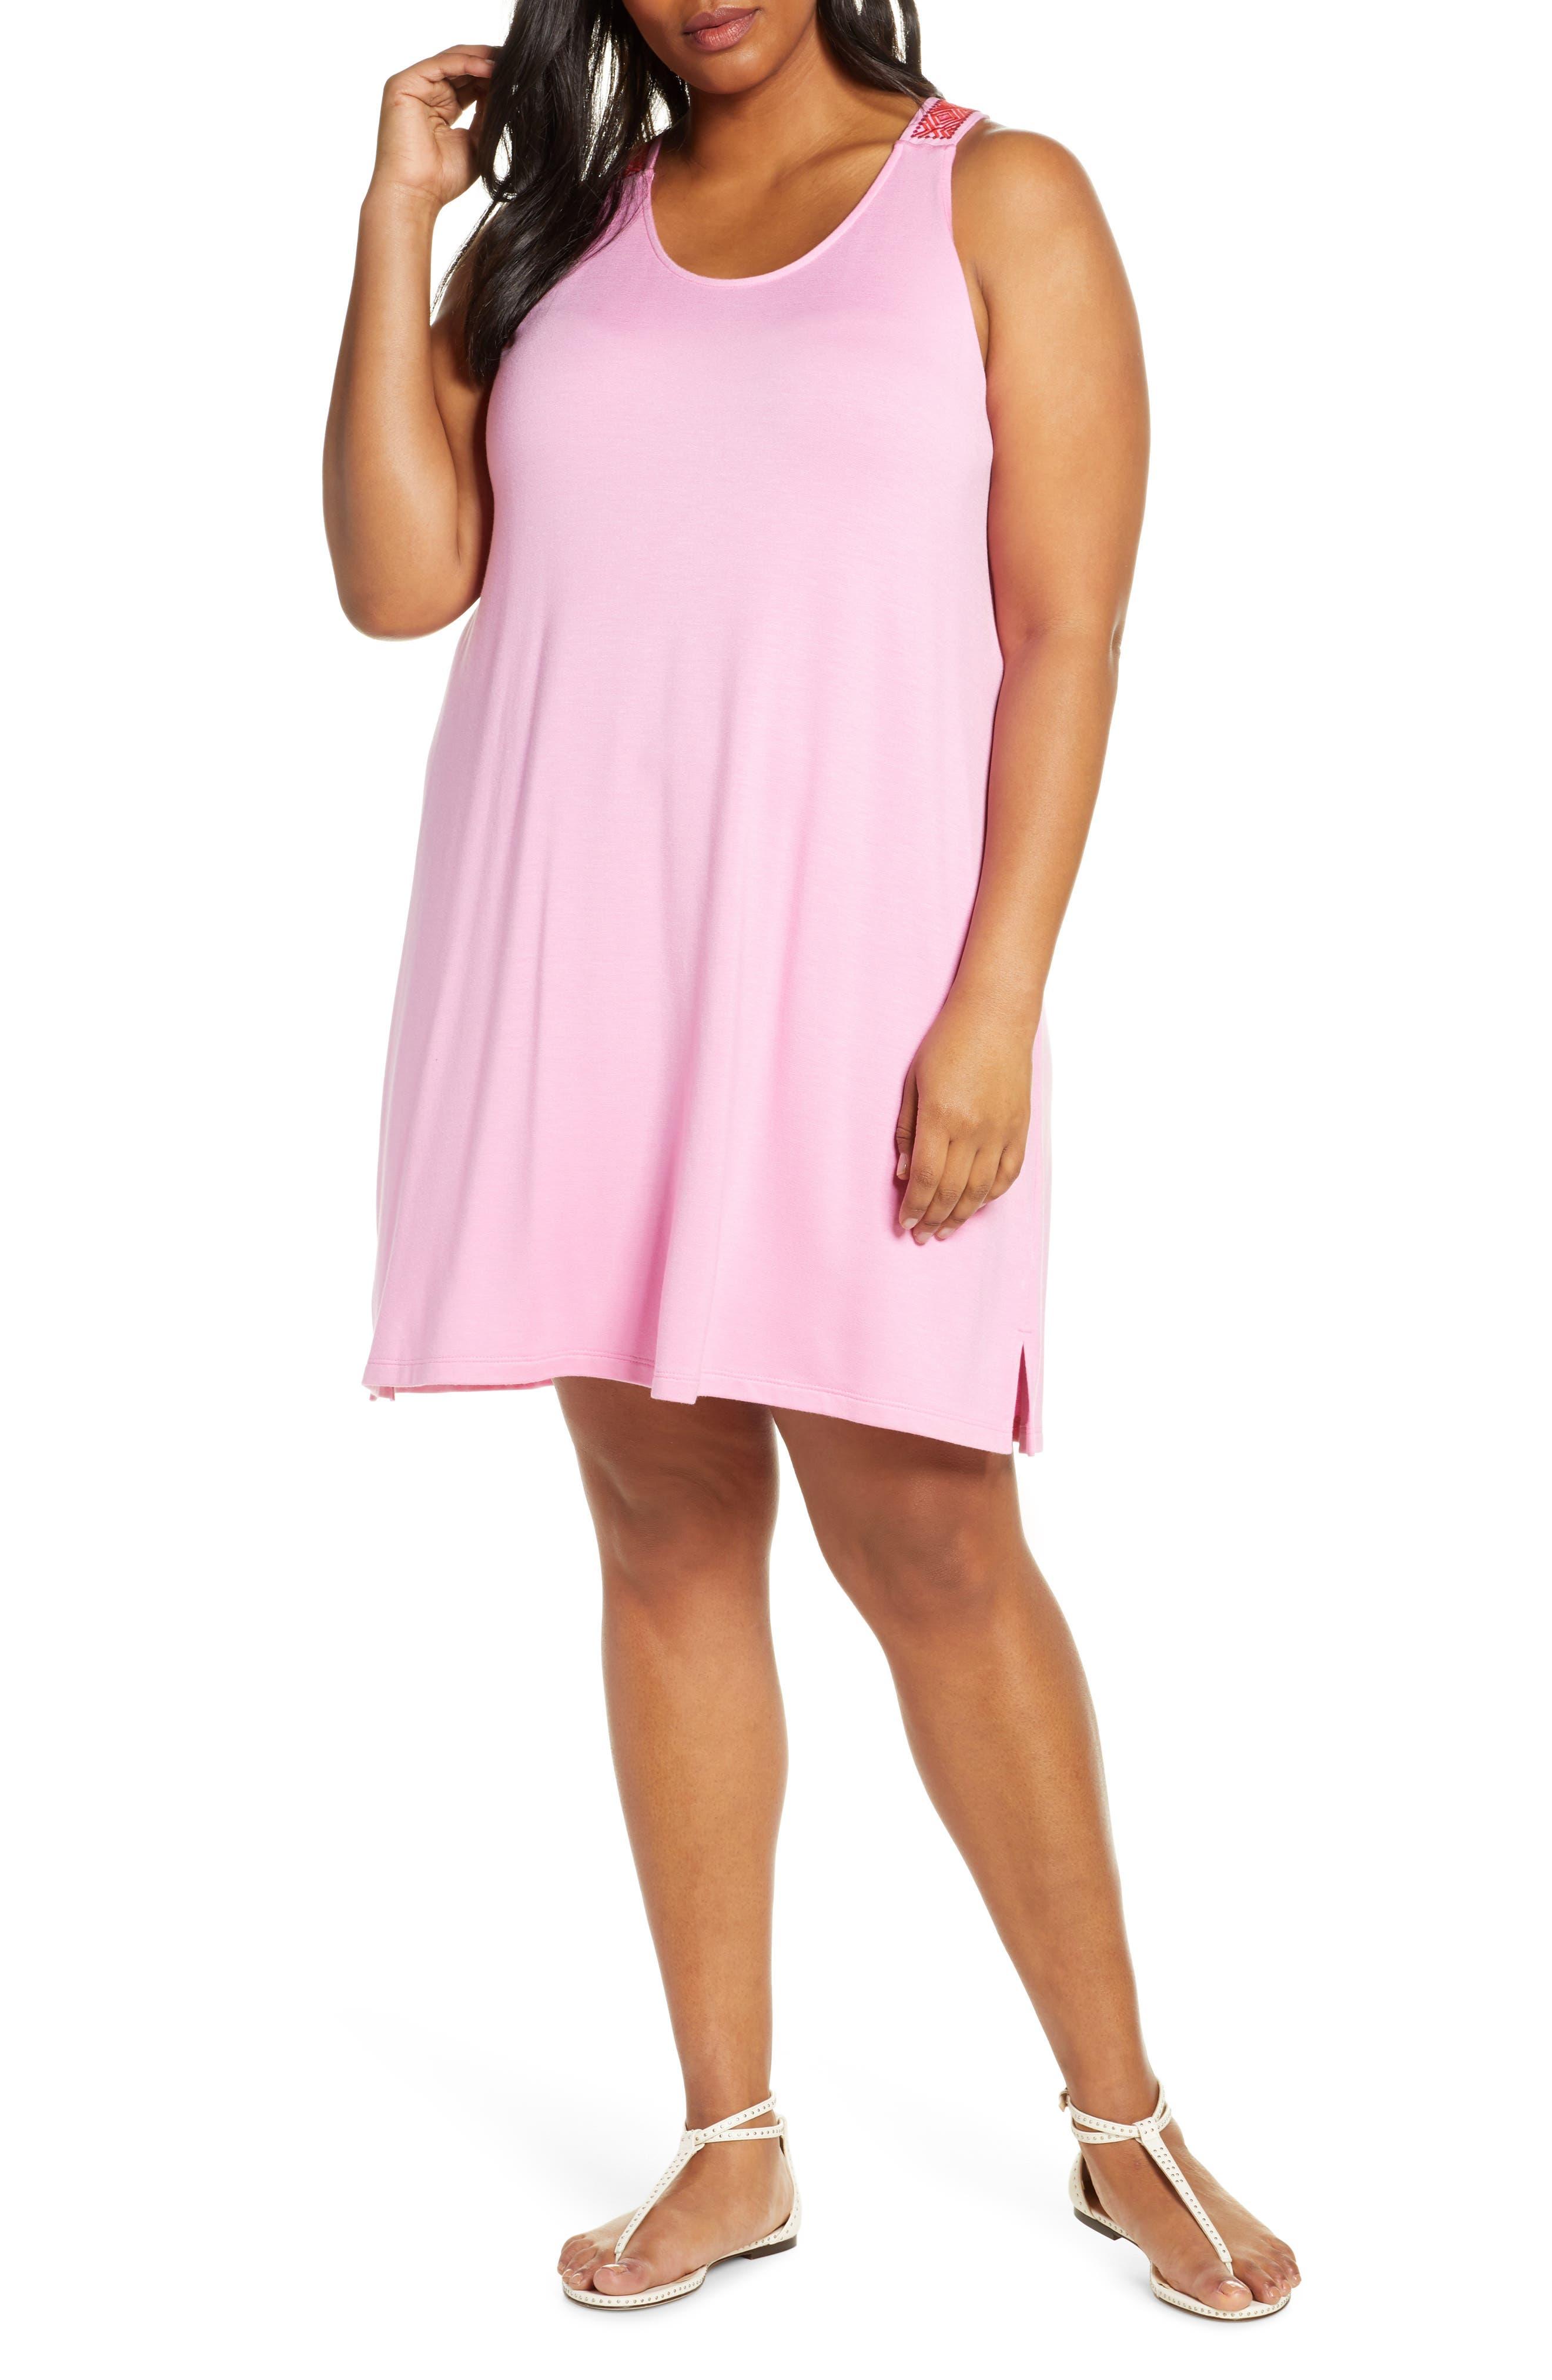 Plus Size Gibson X Hi Sugarplum! Sicily Embroidered Racerback Tank Dress, Pink